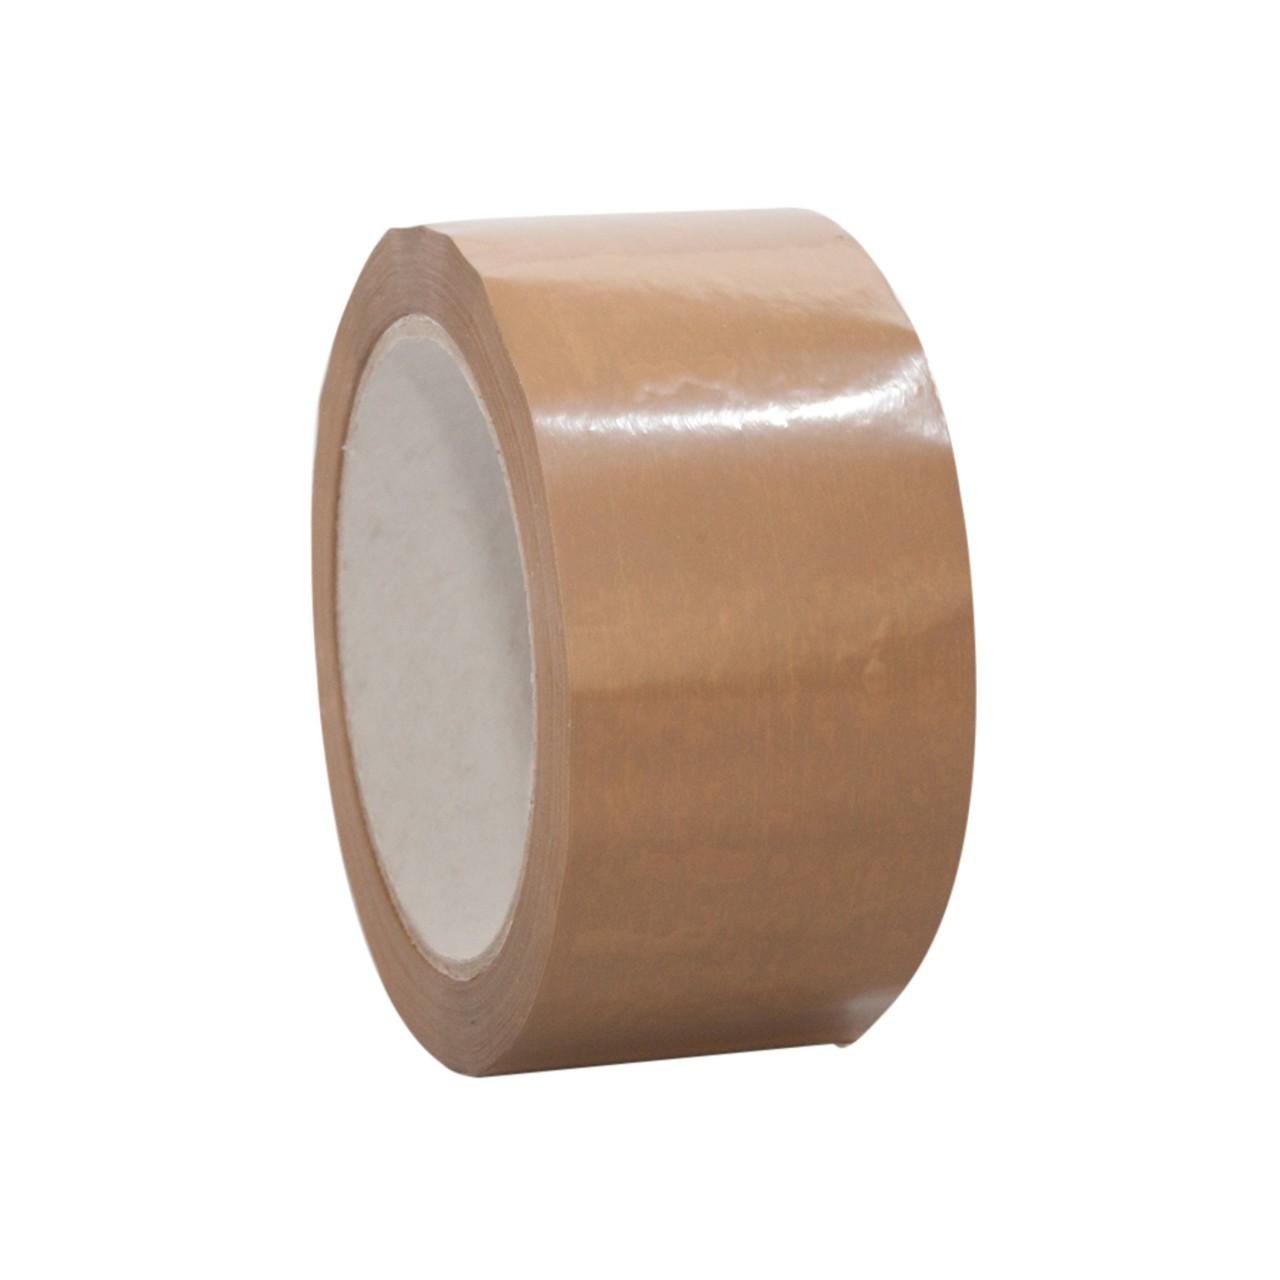 müroll 100, PVC-Verpackungsklebeband, 50mm x 66m, braun